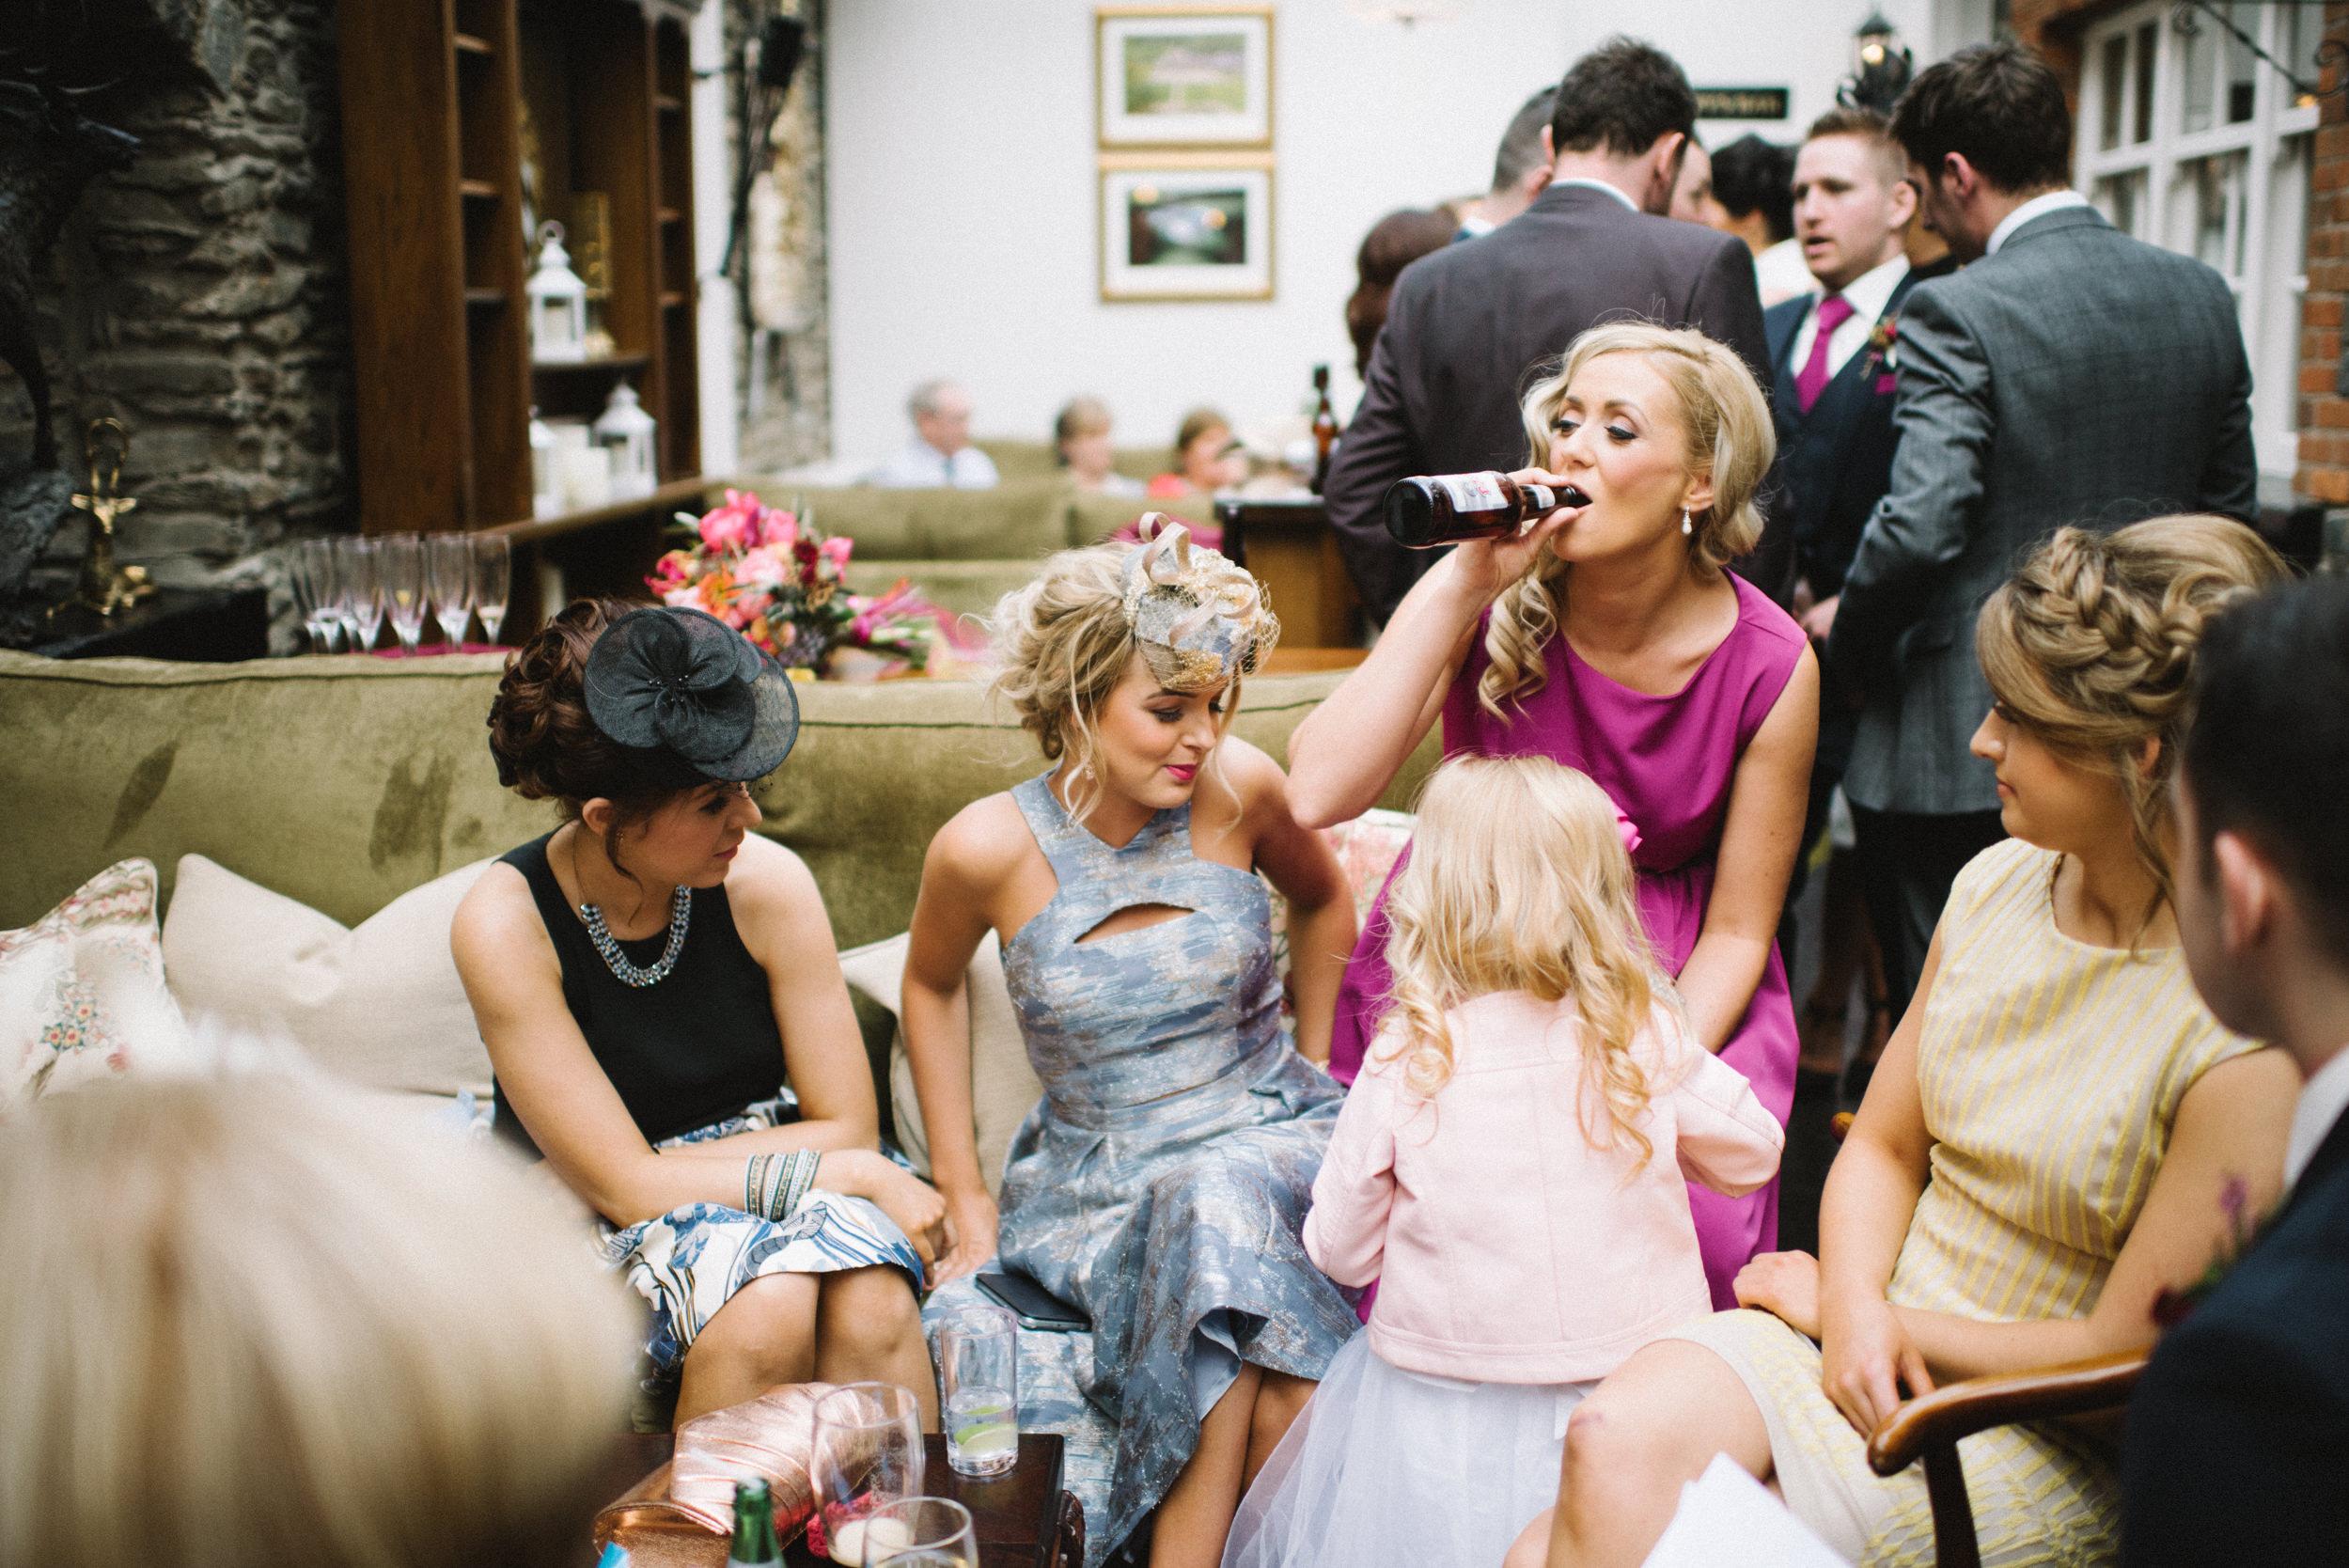 0022-alternative-wedding-portrait-family-kids-photographer-glasgow-scotland.JPG